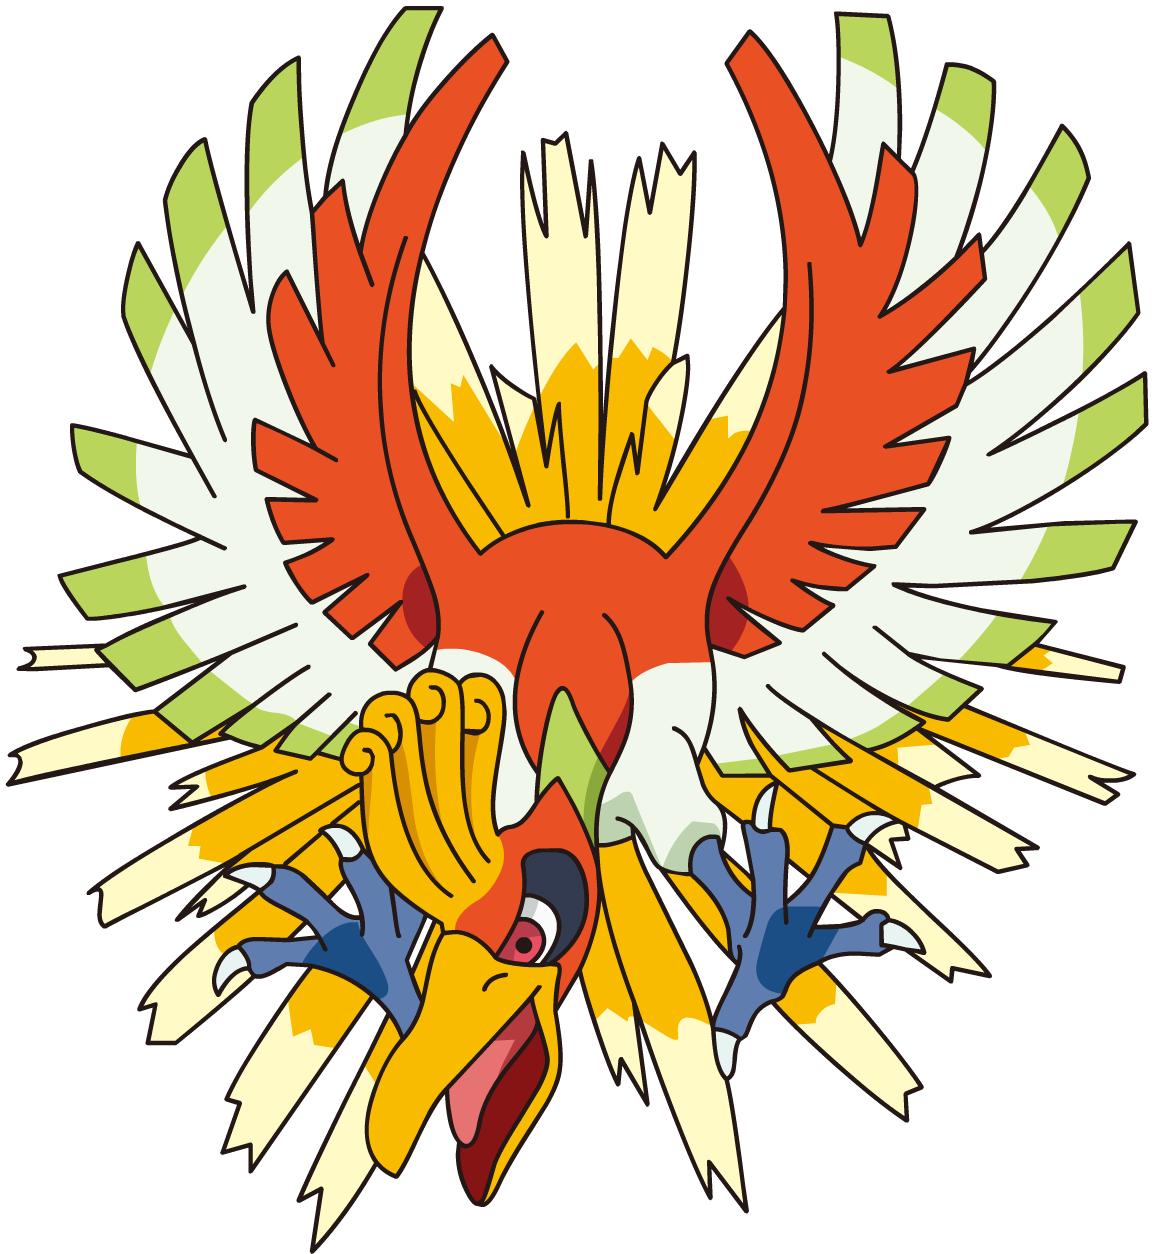 Ho oh sonic pok mon wiki - Pokemon argent pokemon rare ...